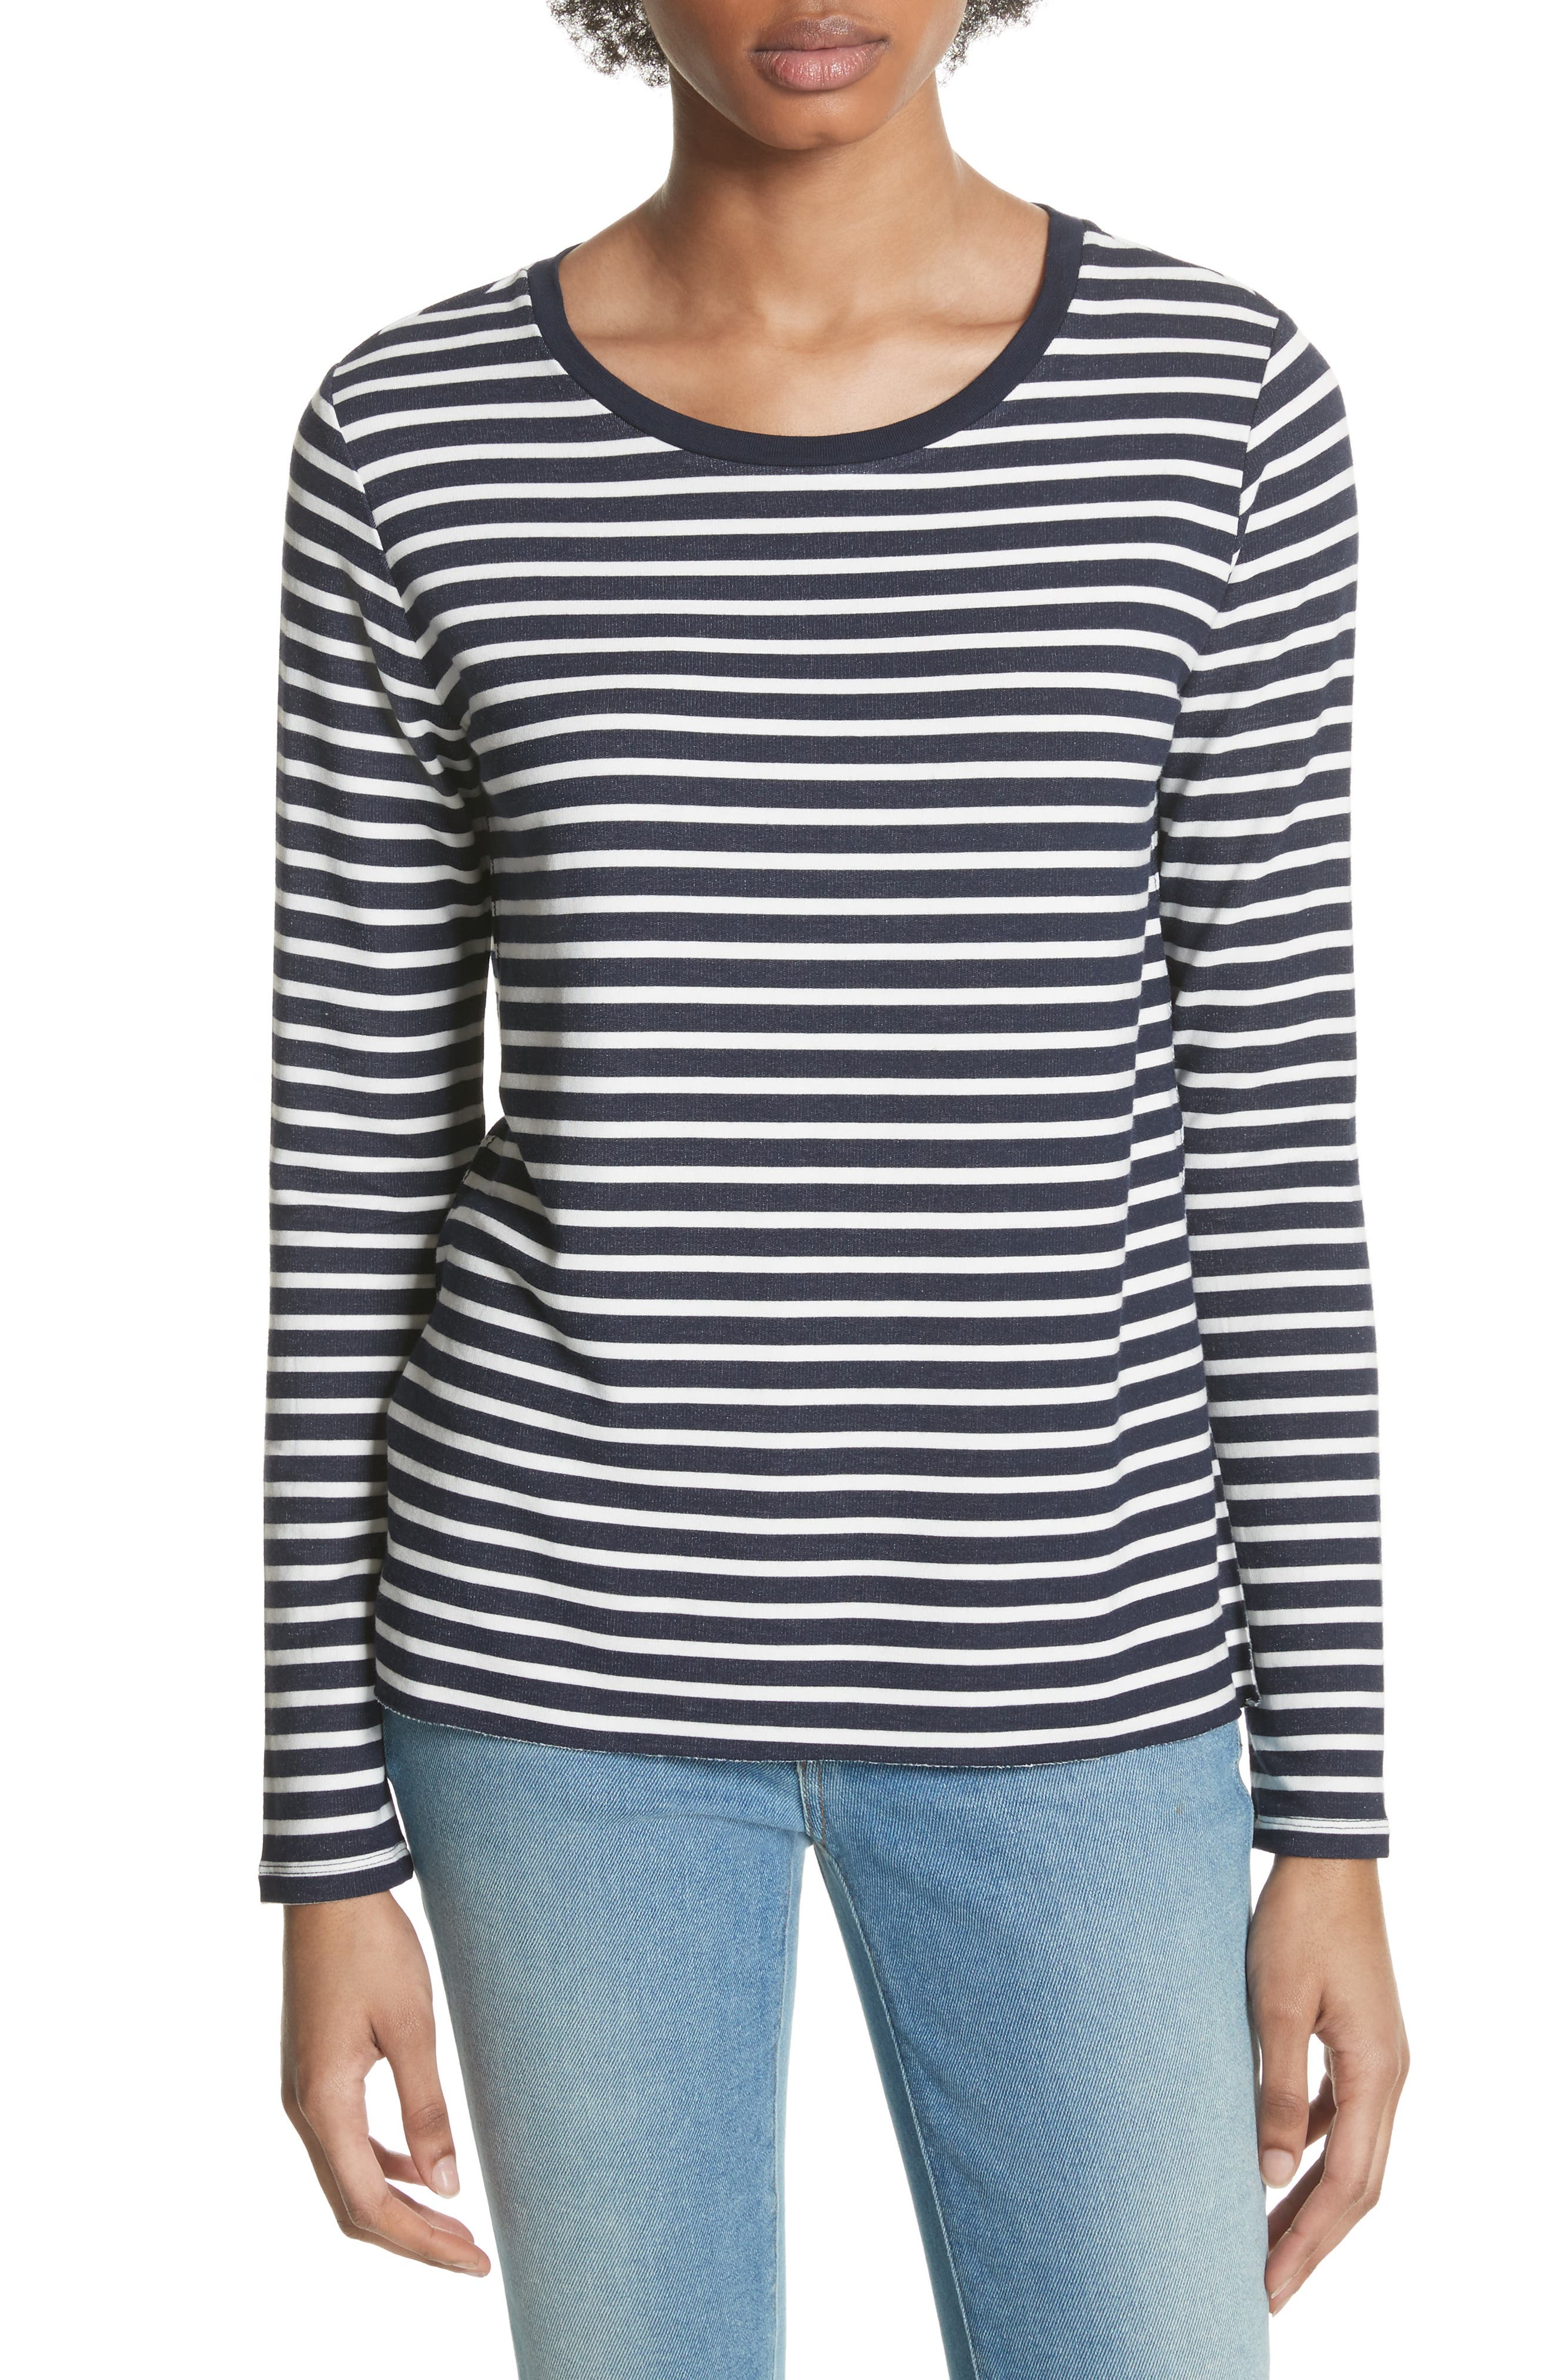 Majestic Filatures Stripe Sweatshirt